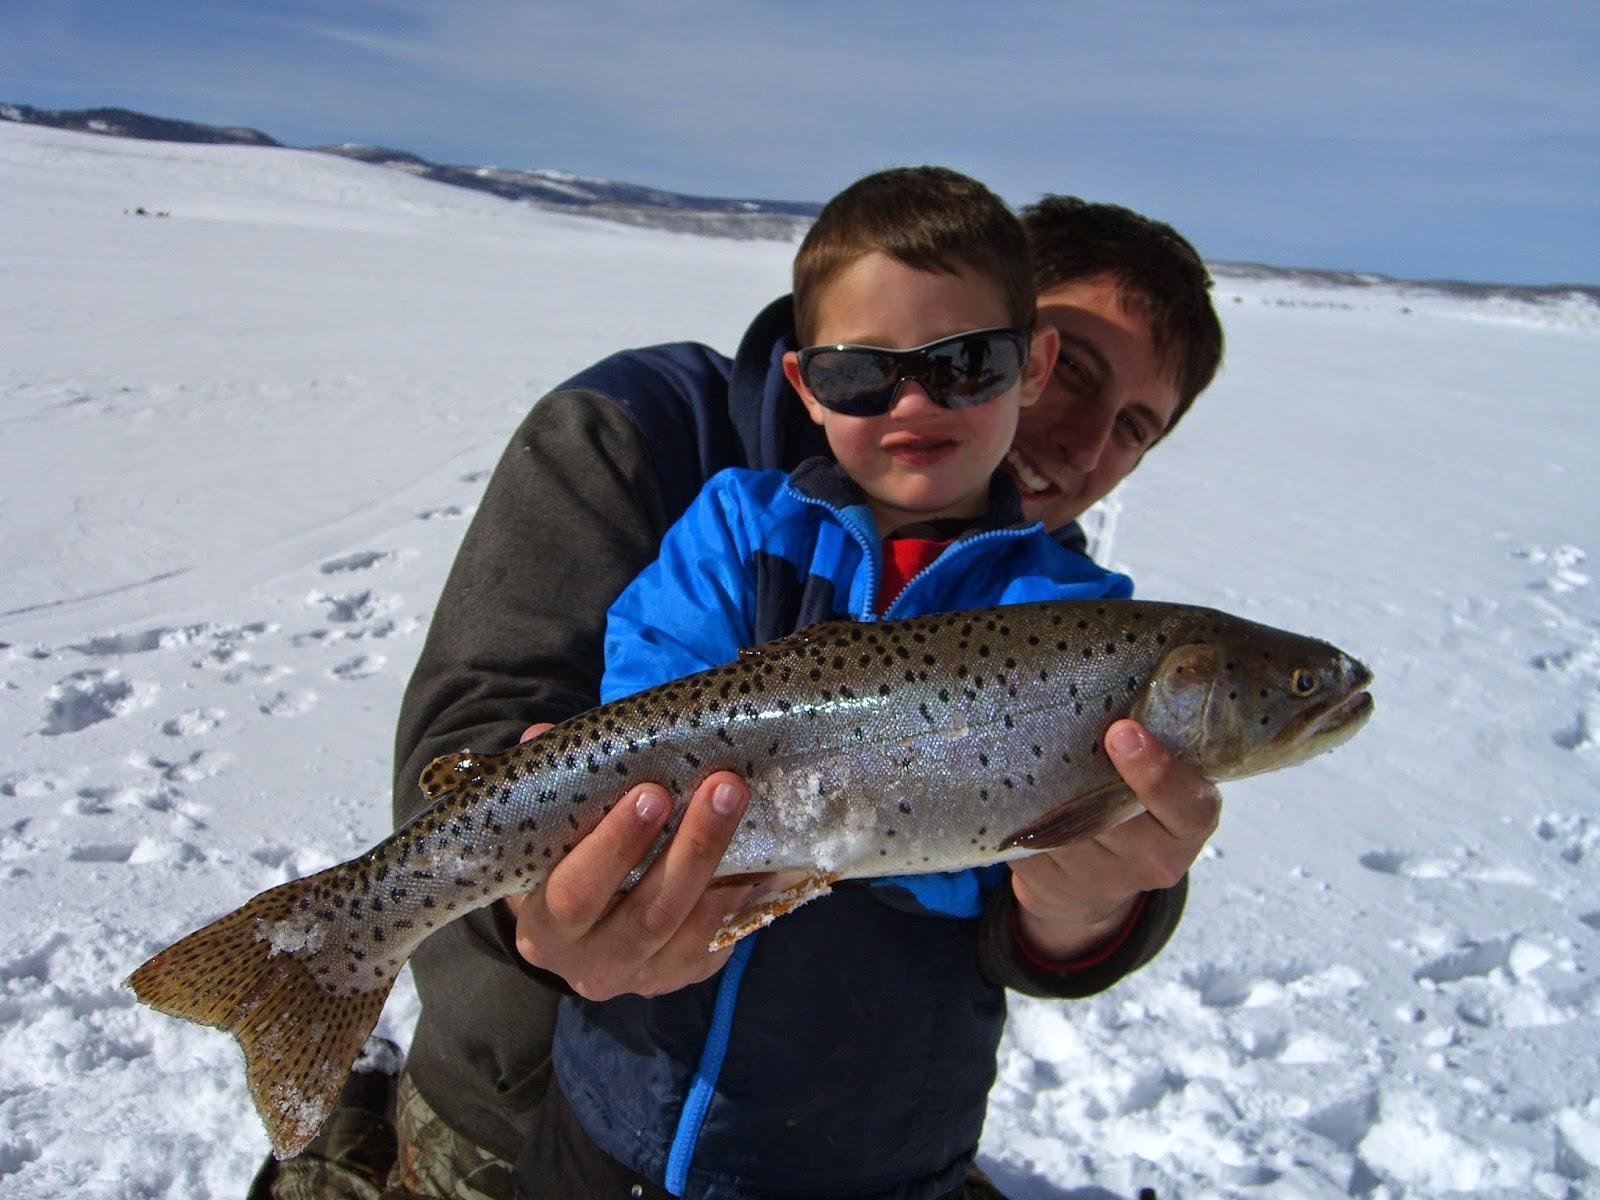 Utah fisherman winter fishing season 2015 for Strawberry reservoir fishing